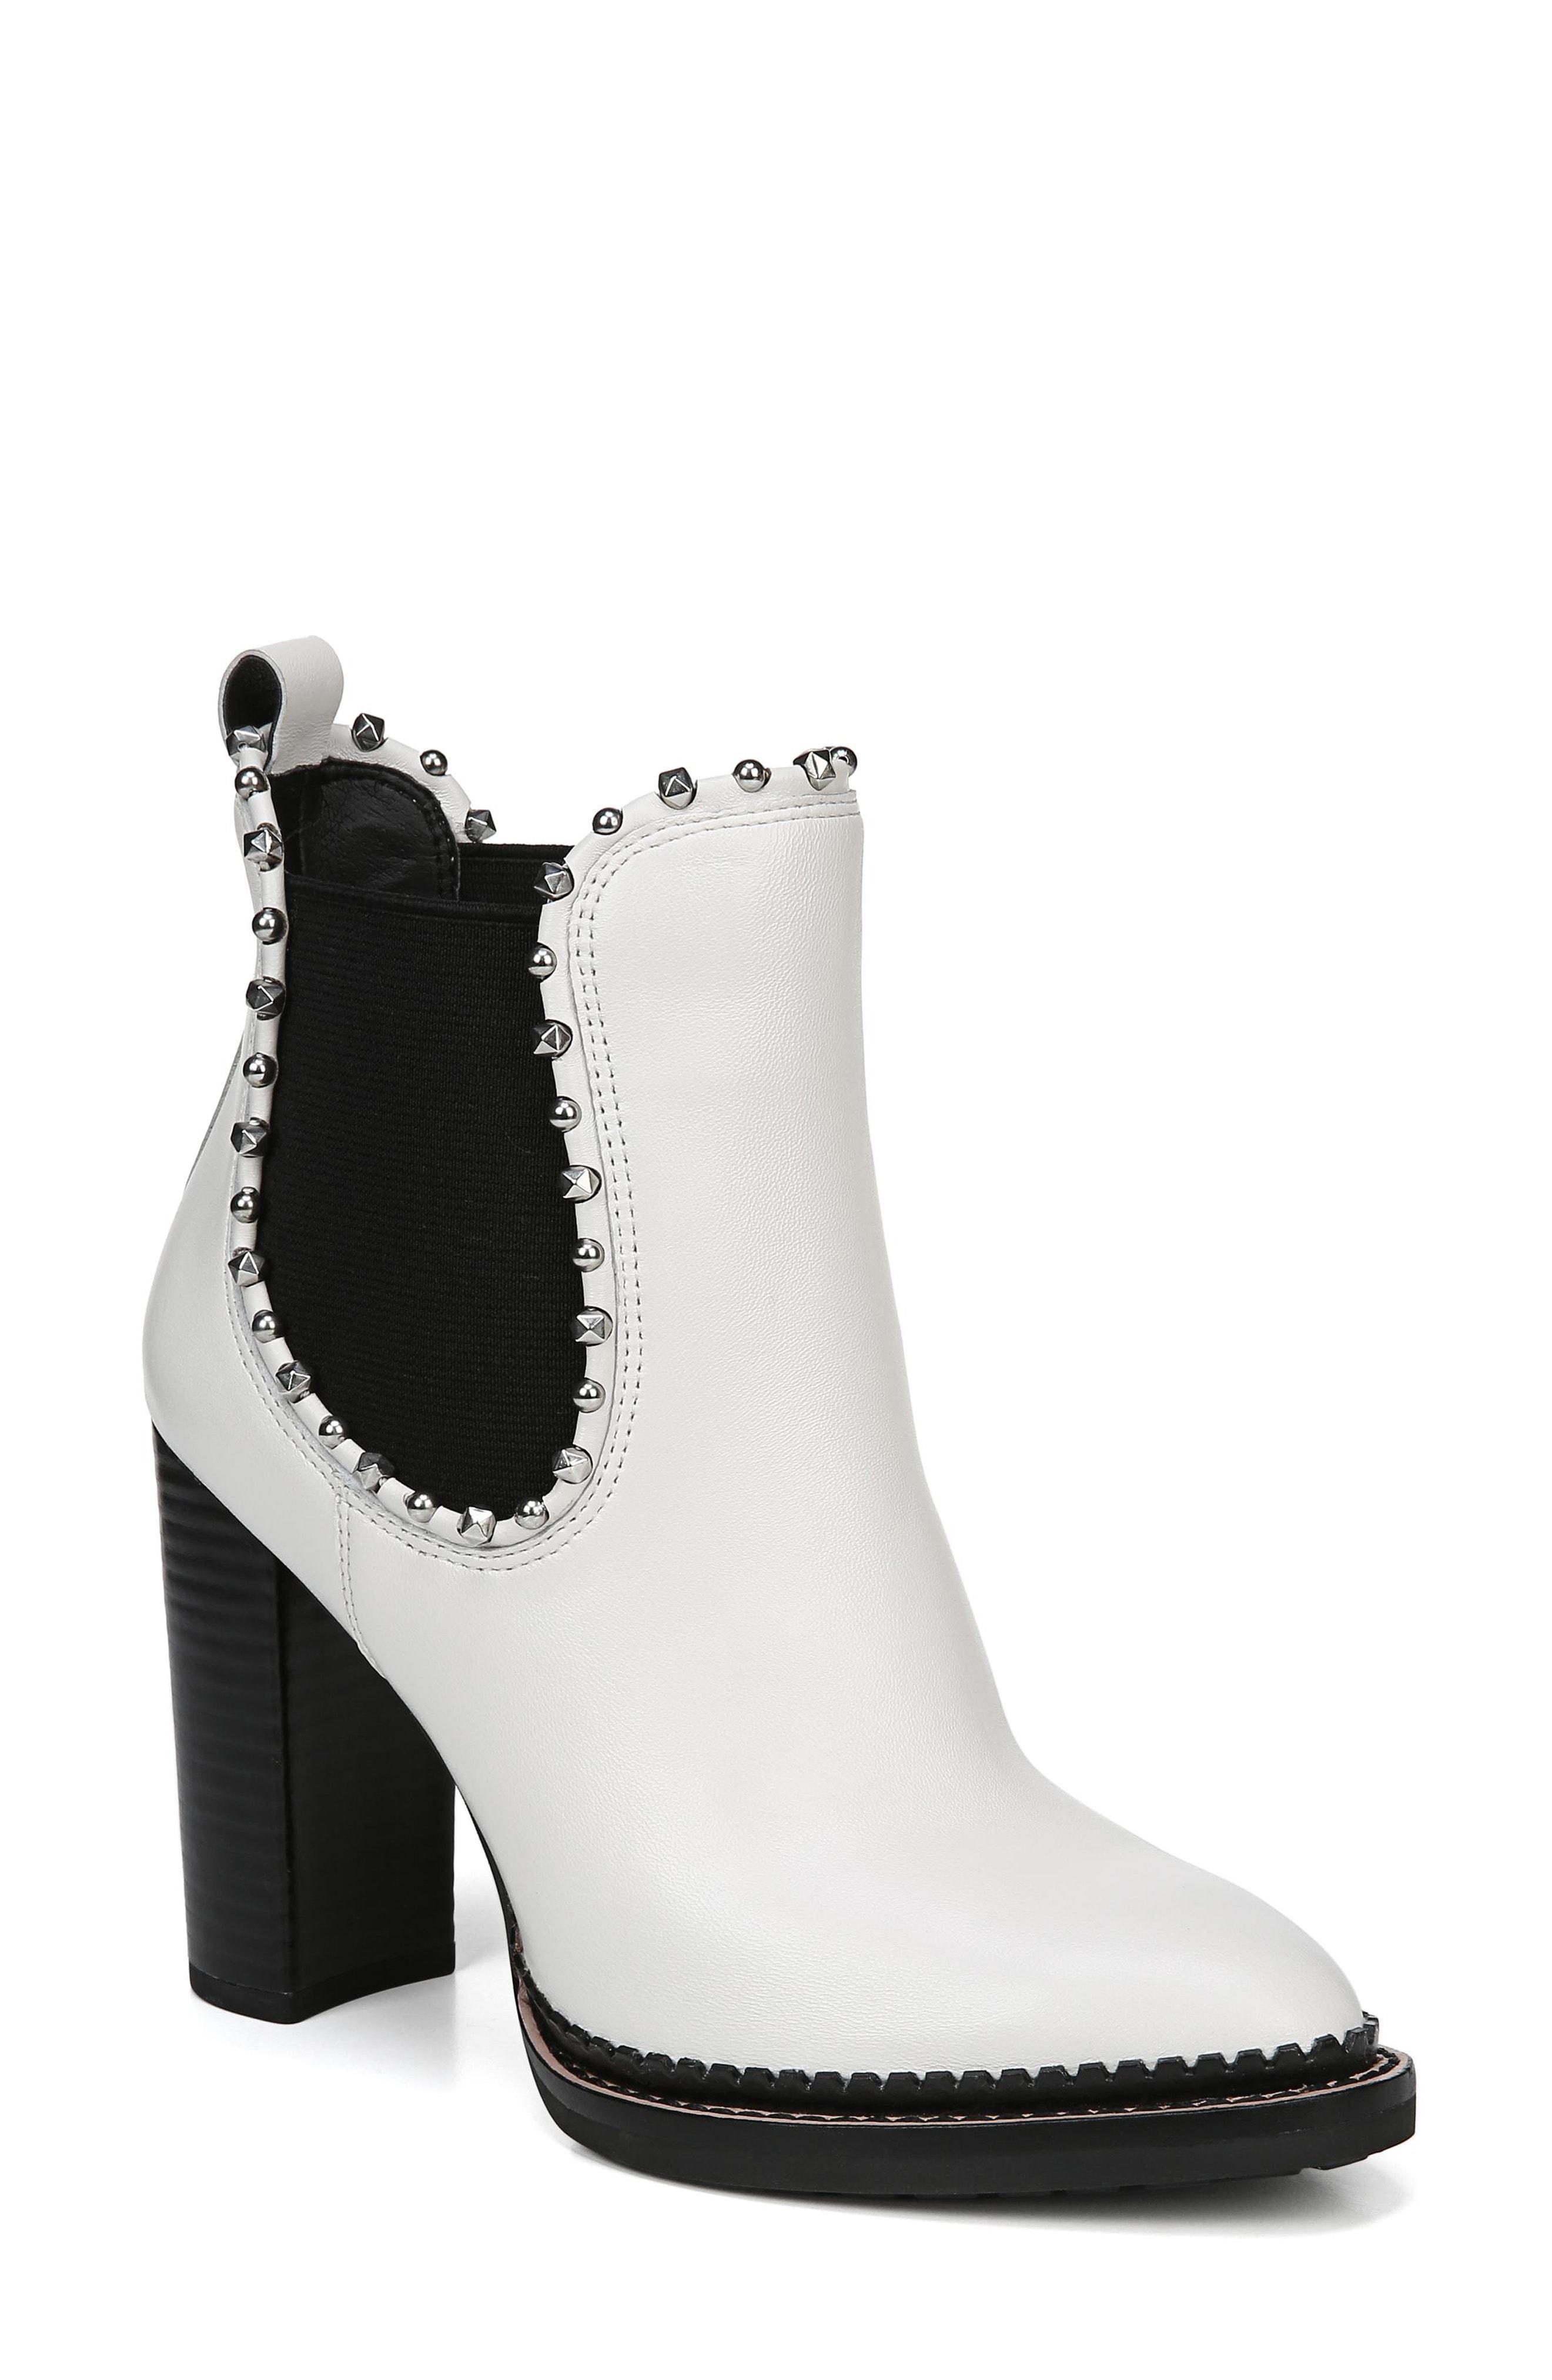 6a0f7b44e3b Sam Edelman Salma Studded Chelsea Boot in White - Save ...